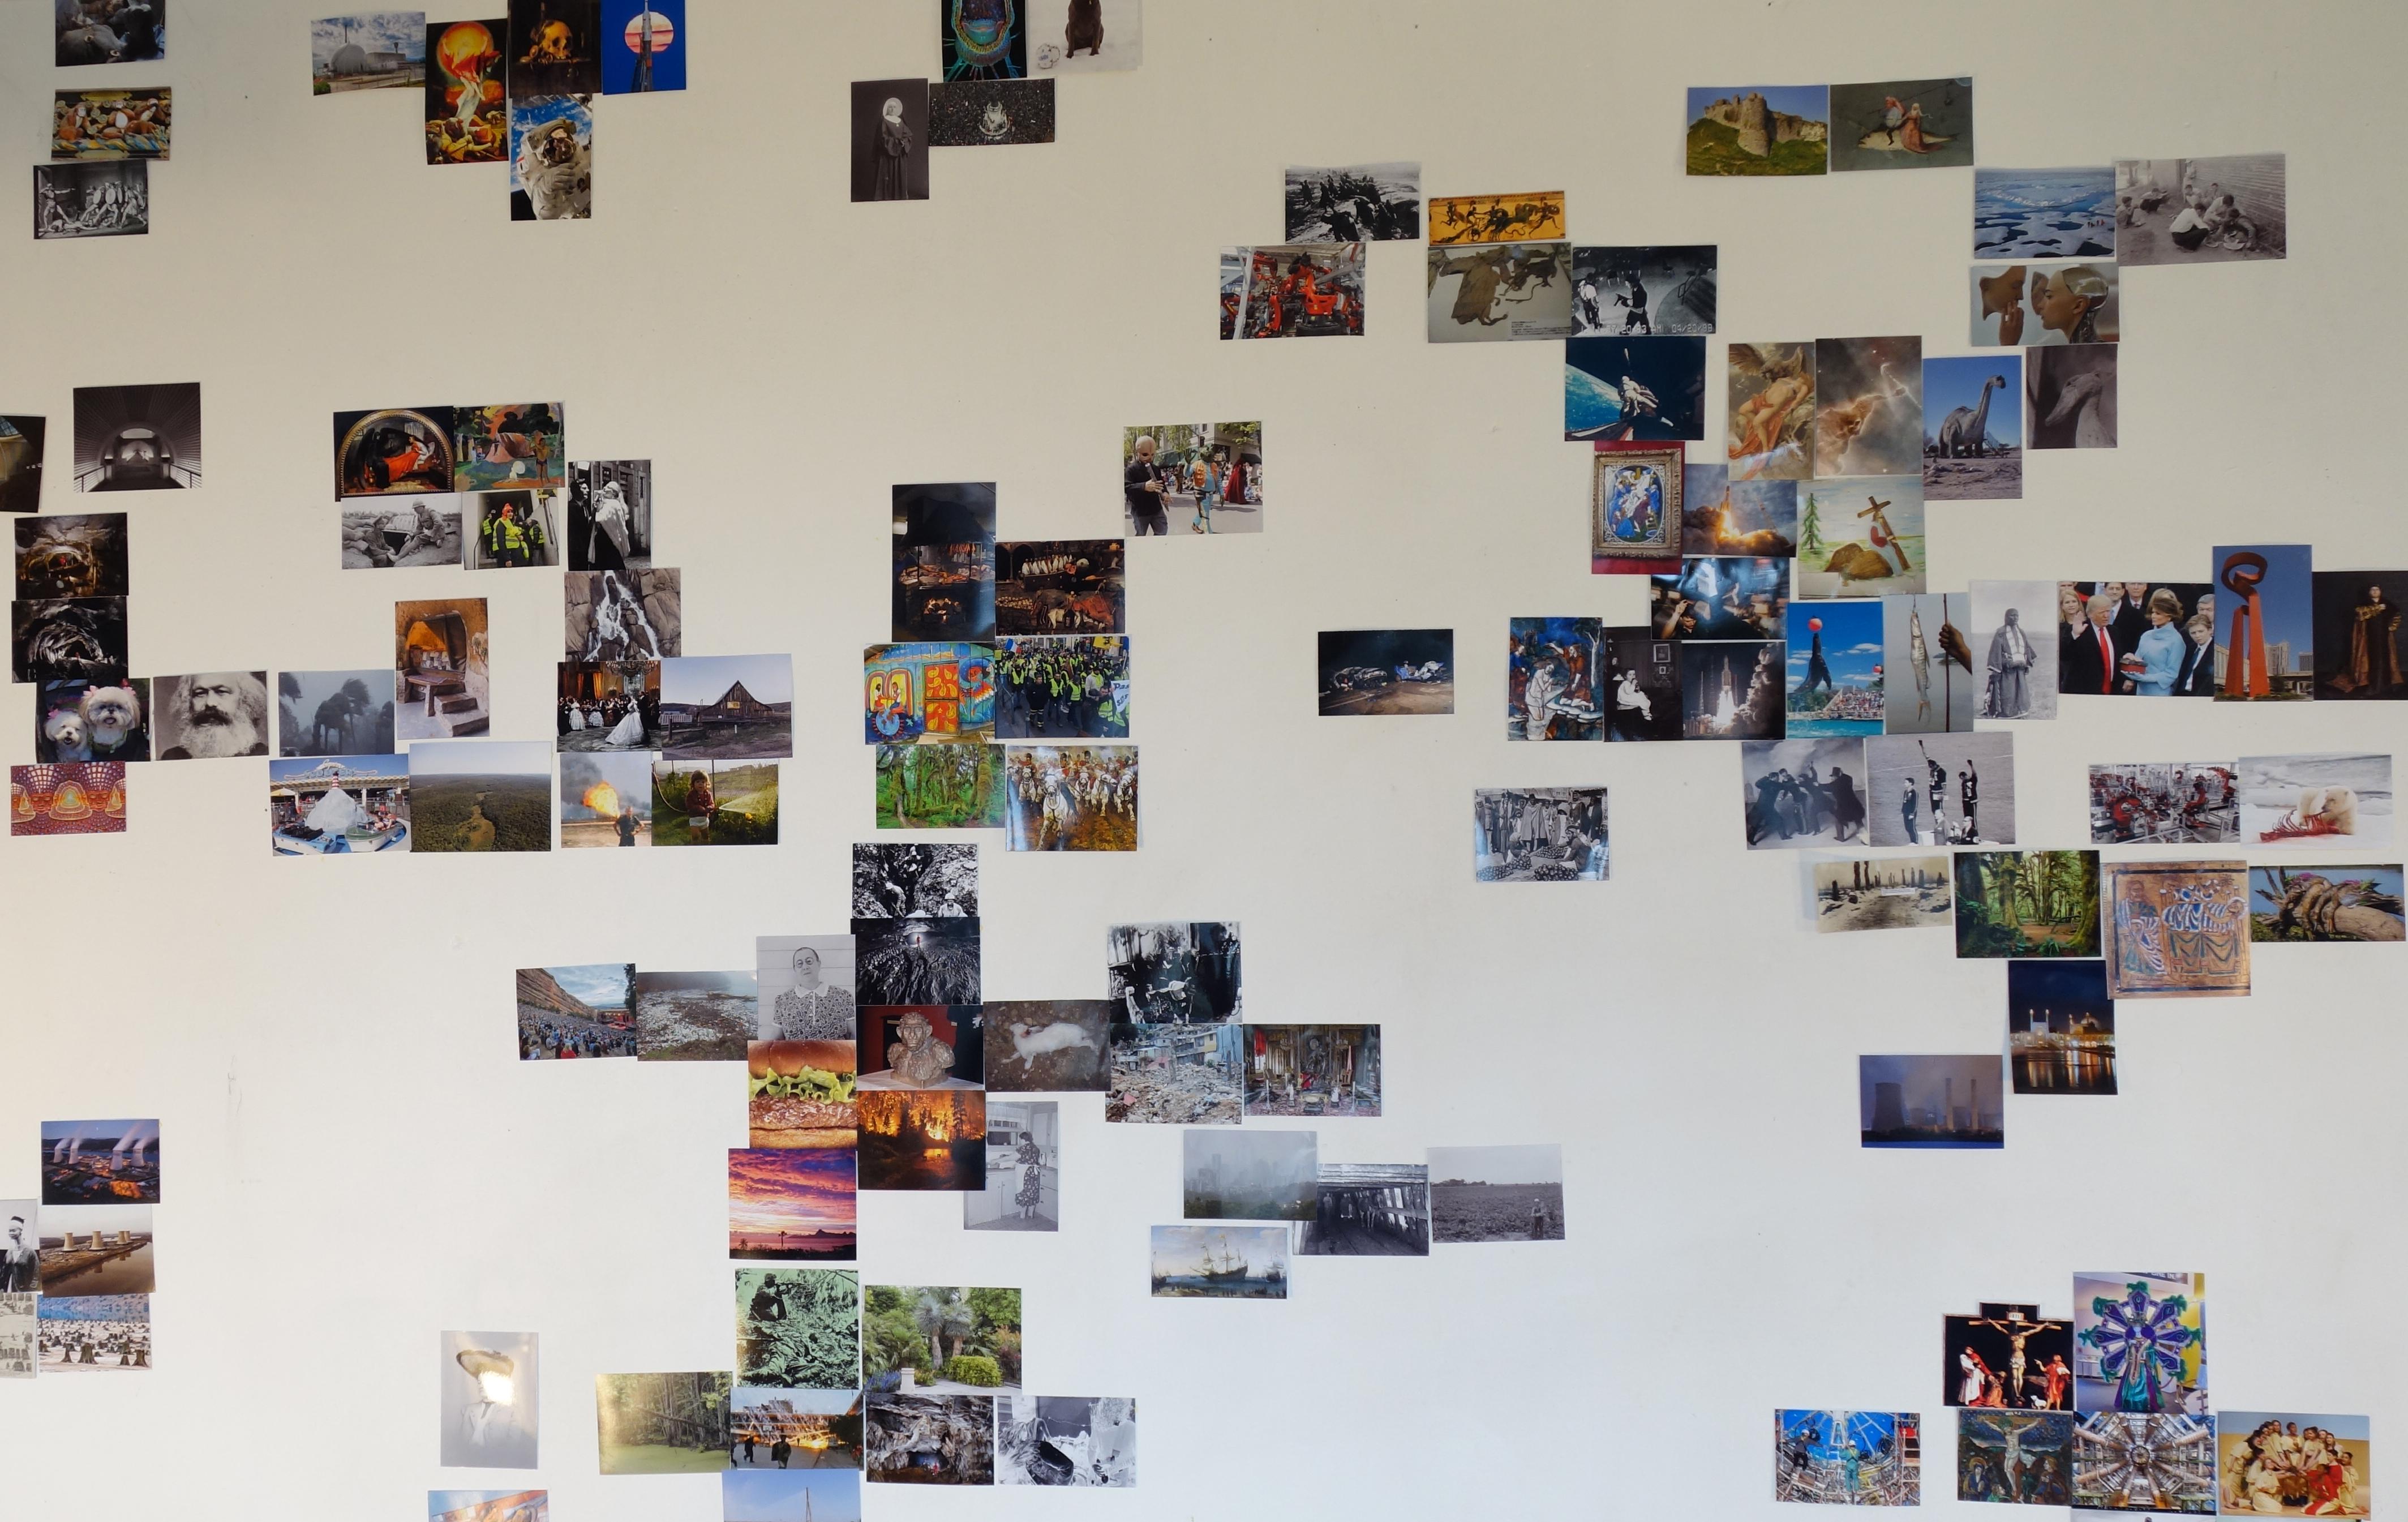 Mur d'image